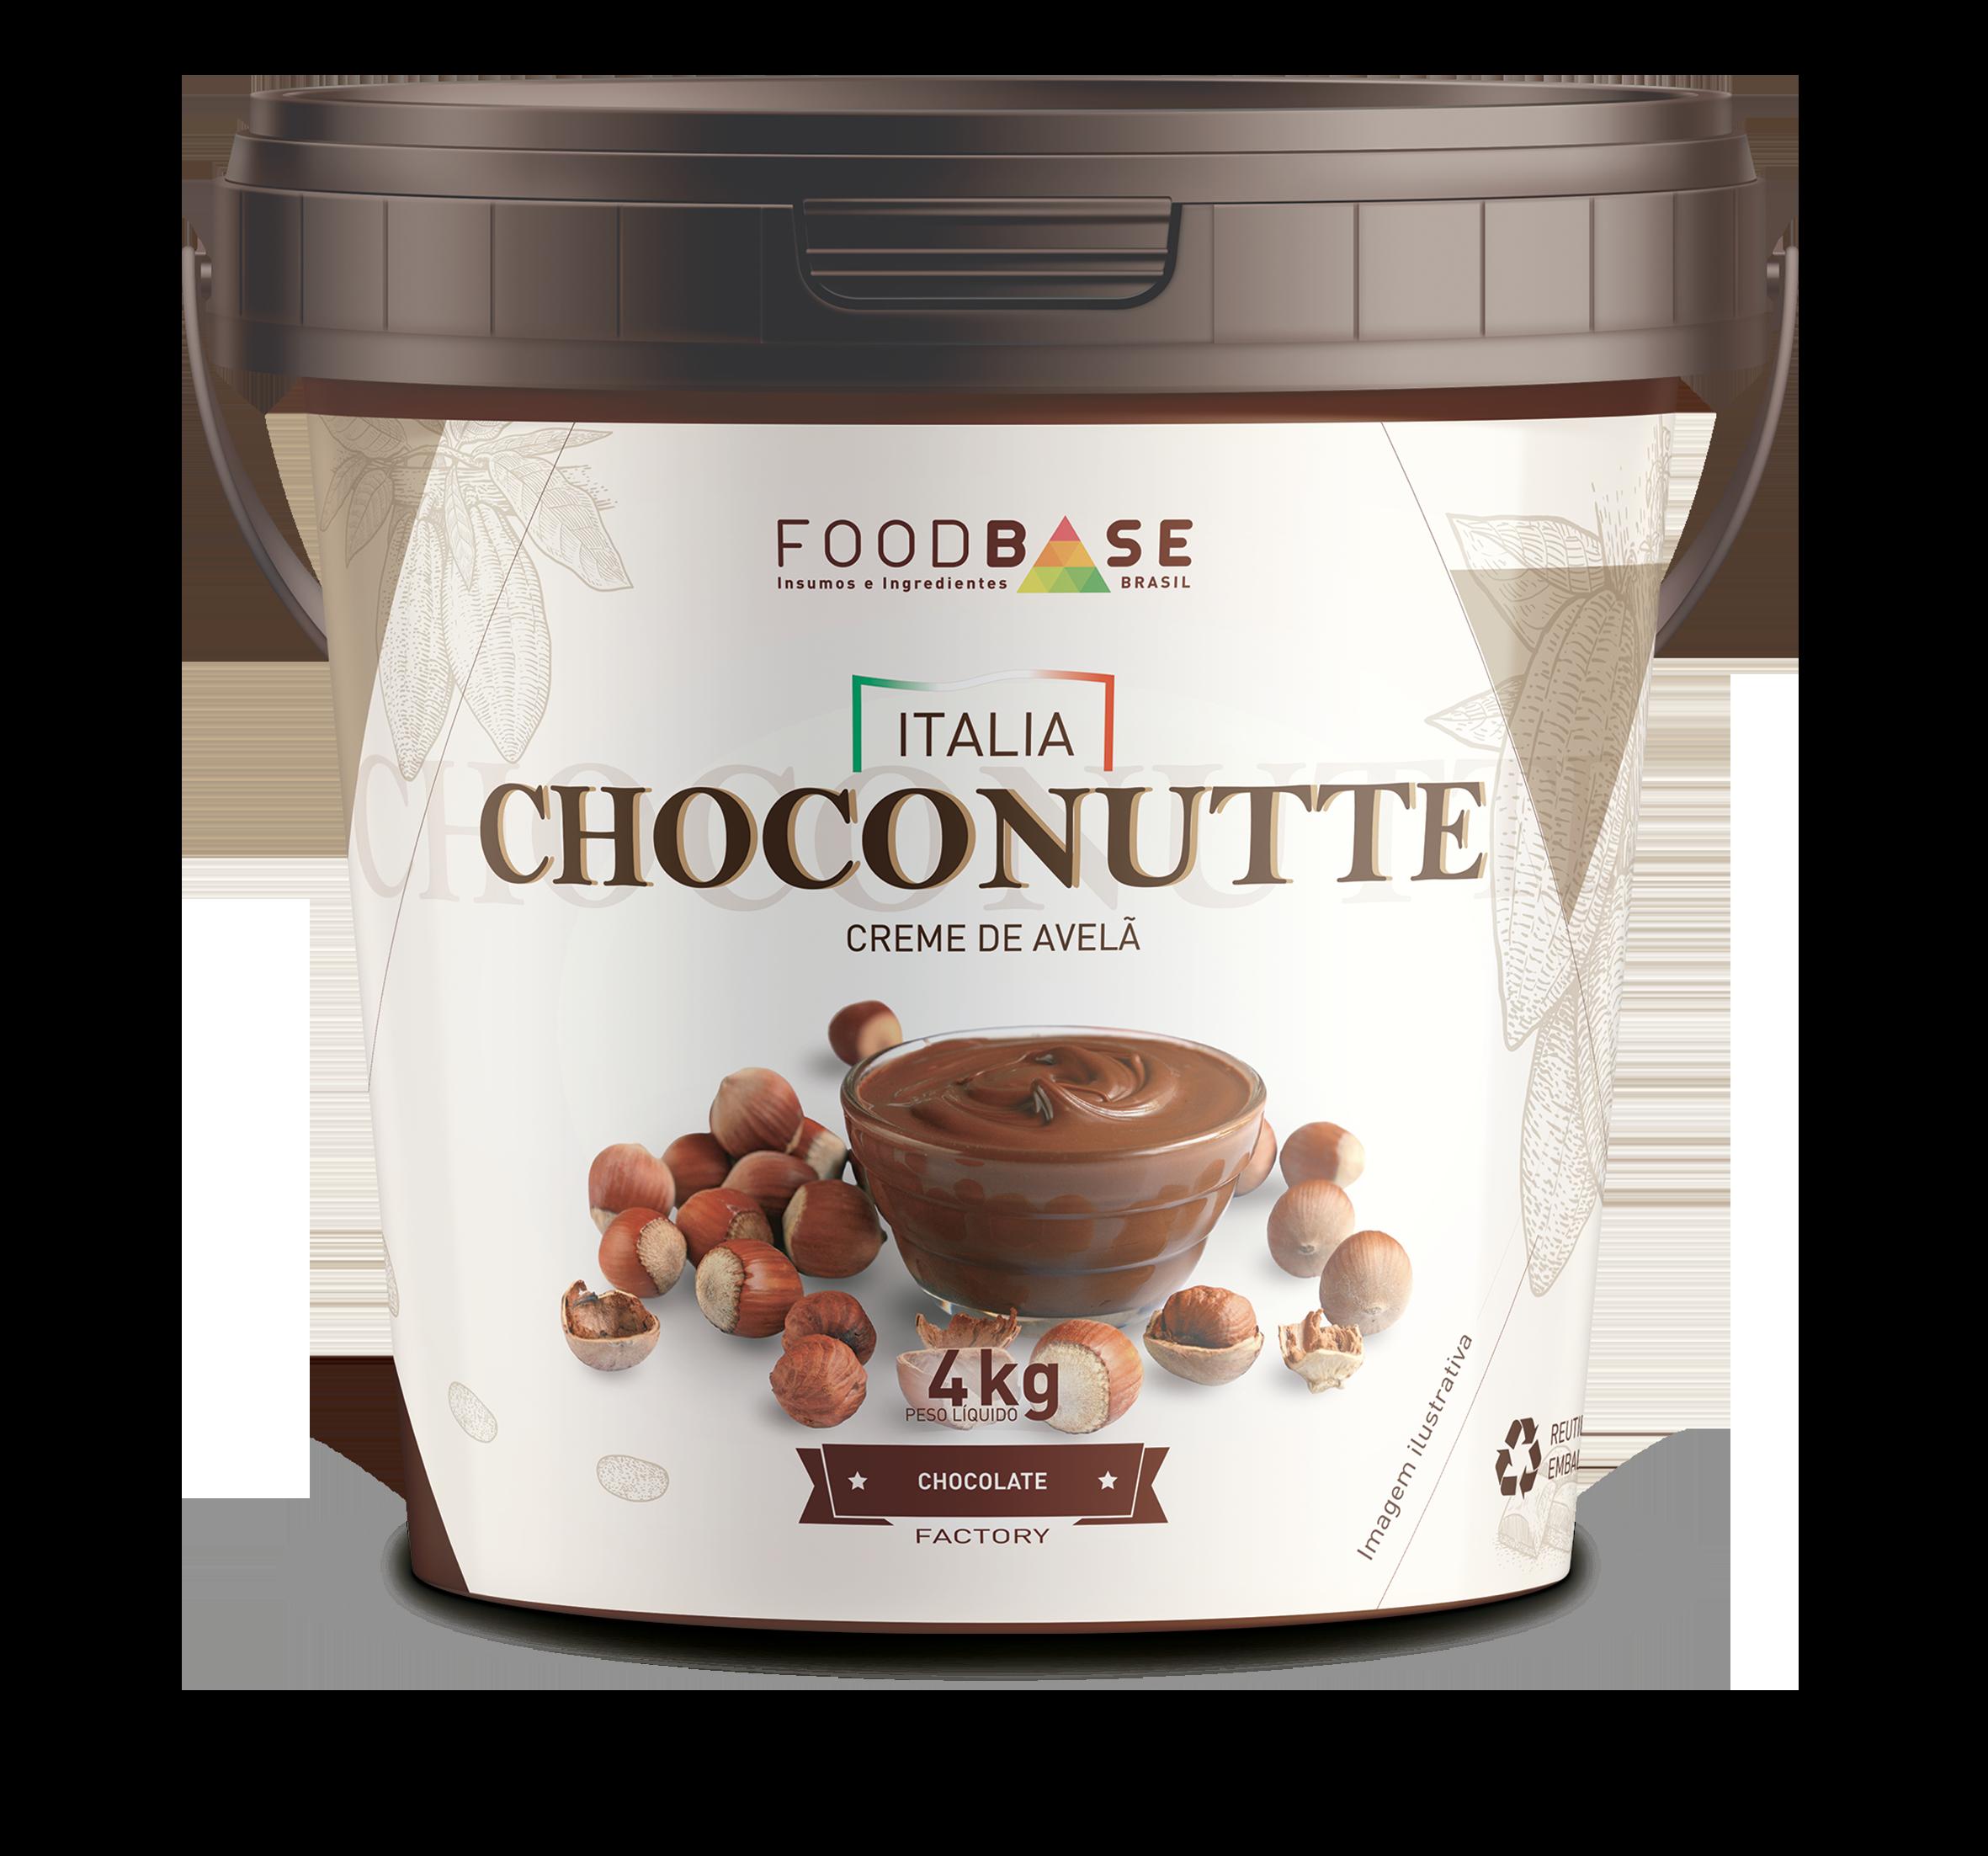 CCF - Choconutte Itália (creme de avelã)